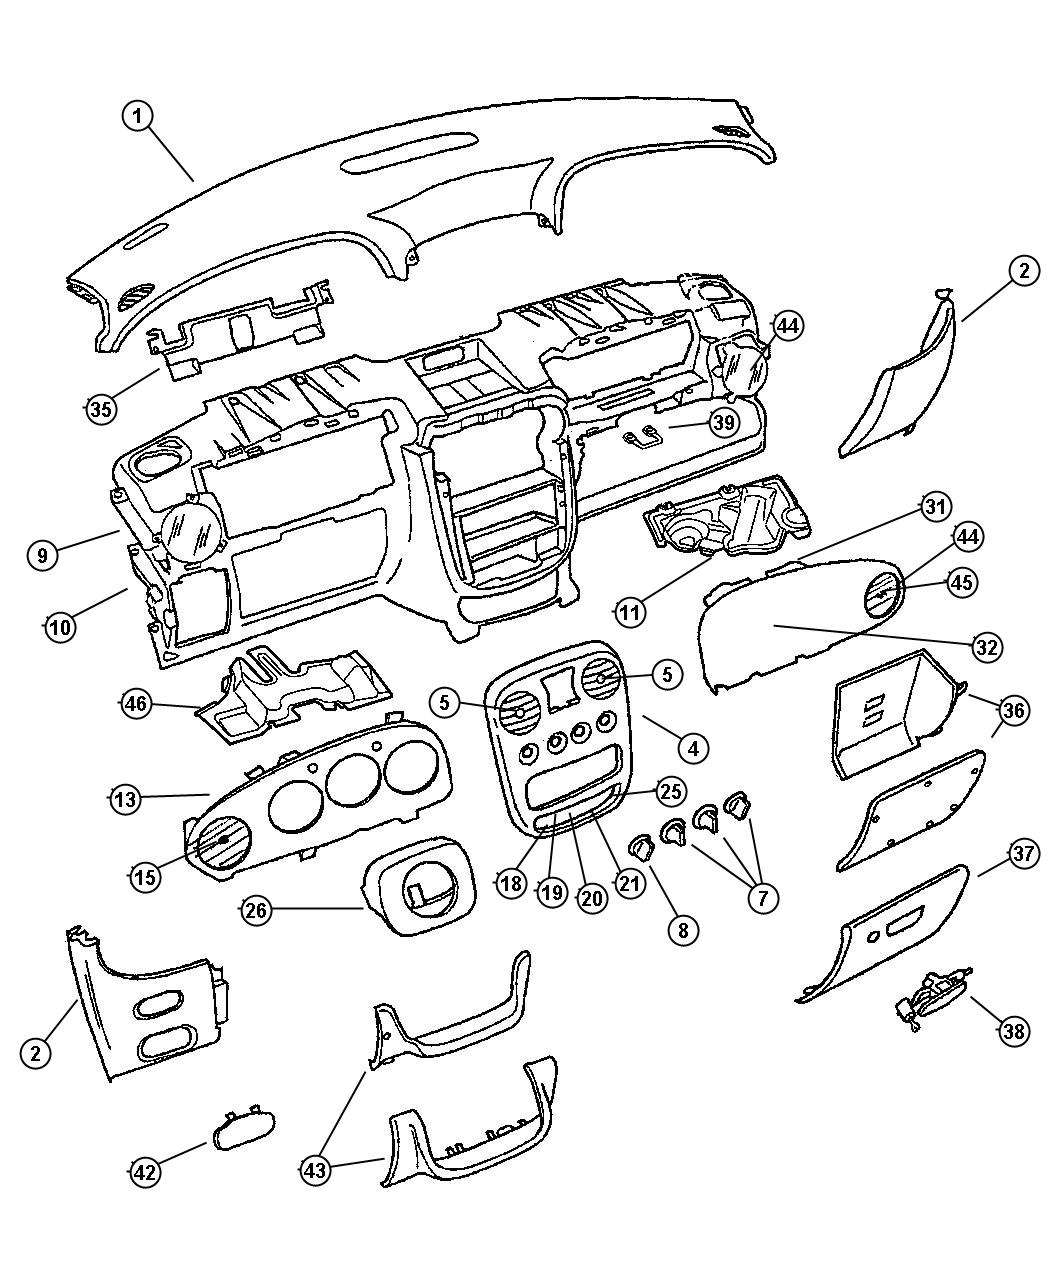 Chrysler PT Cruiser Panel. Instrument panel. With